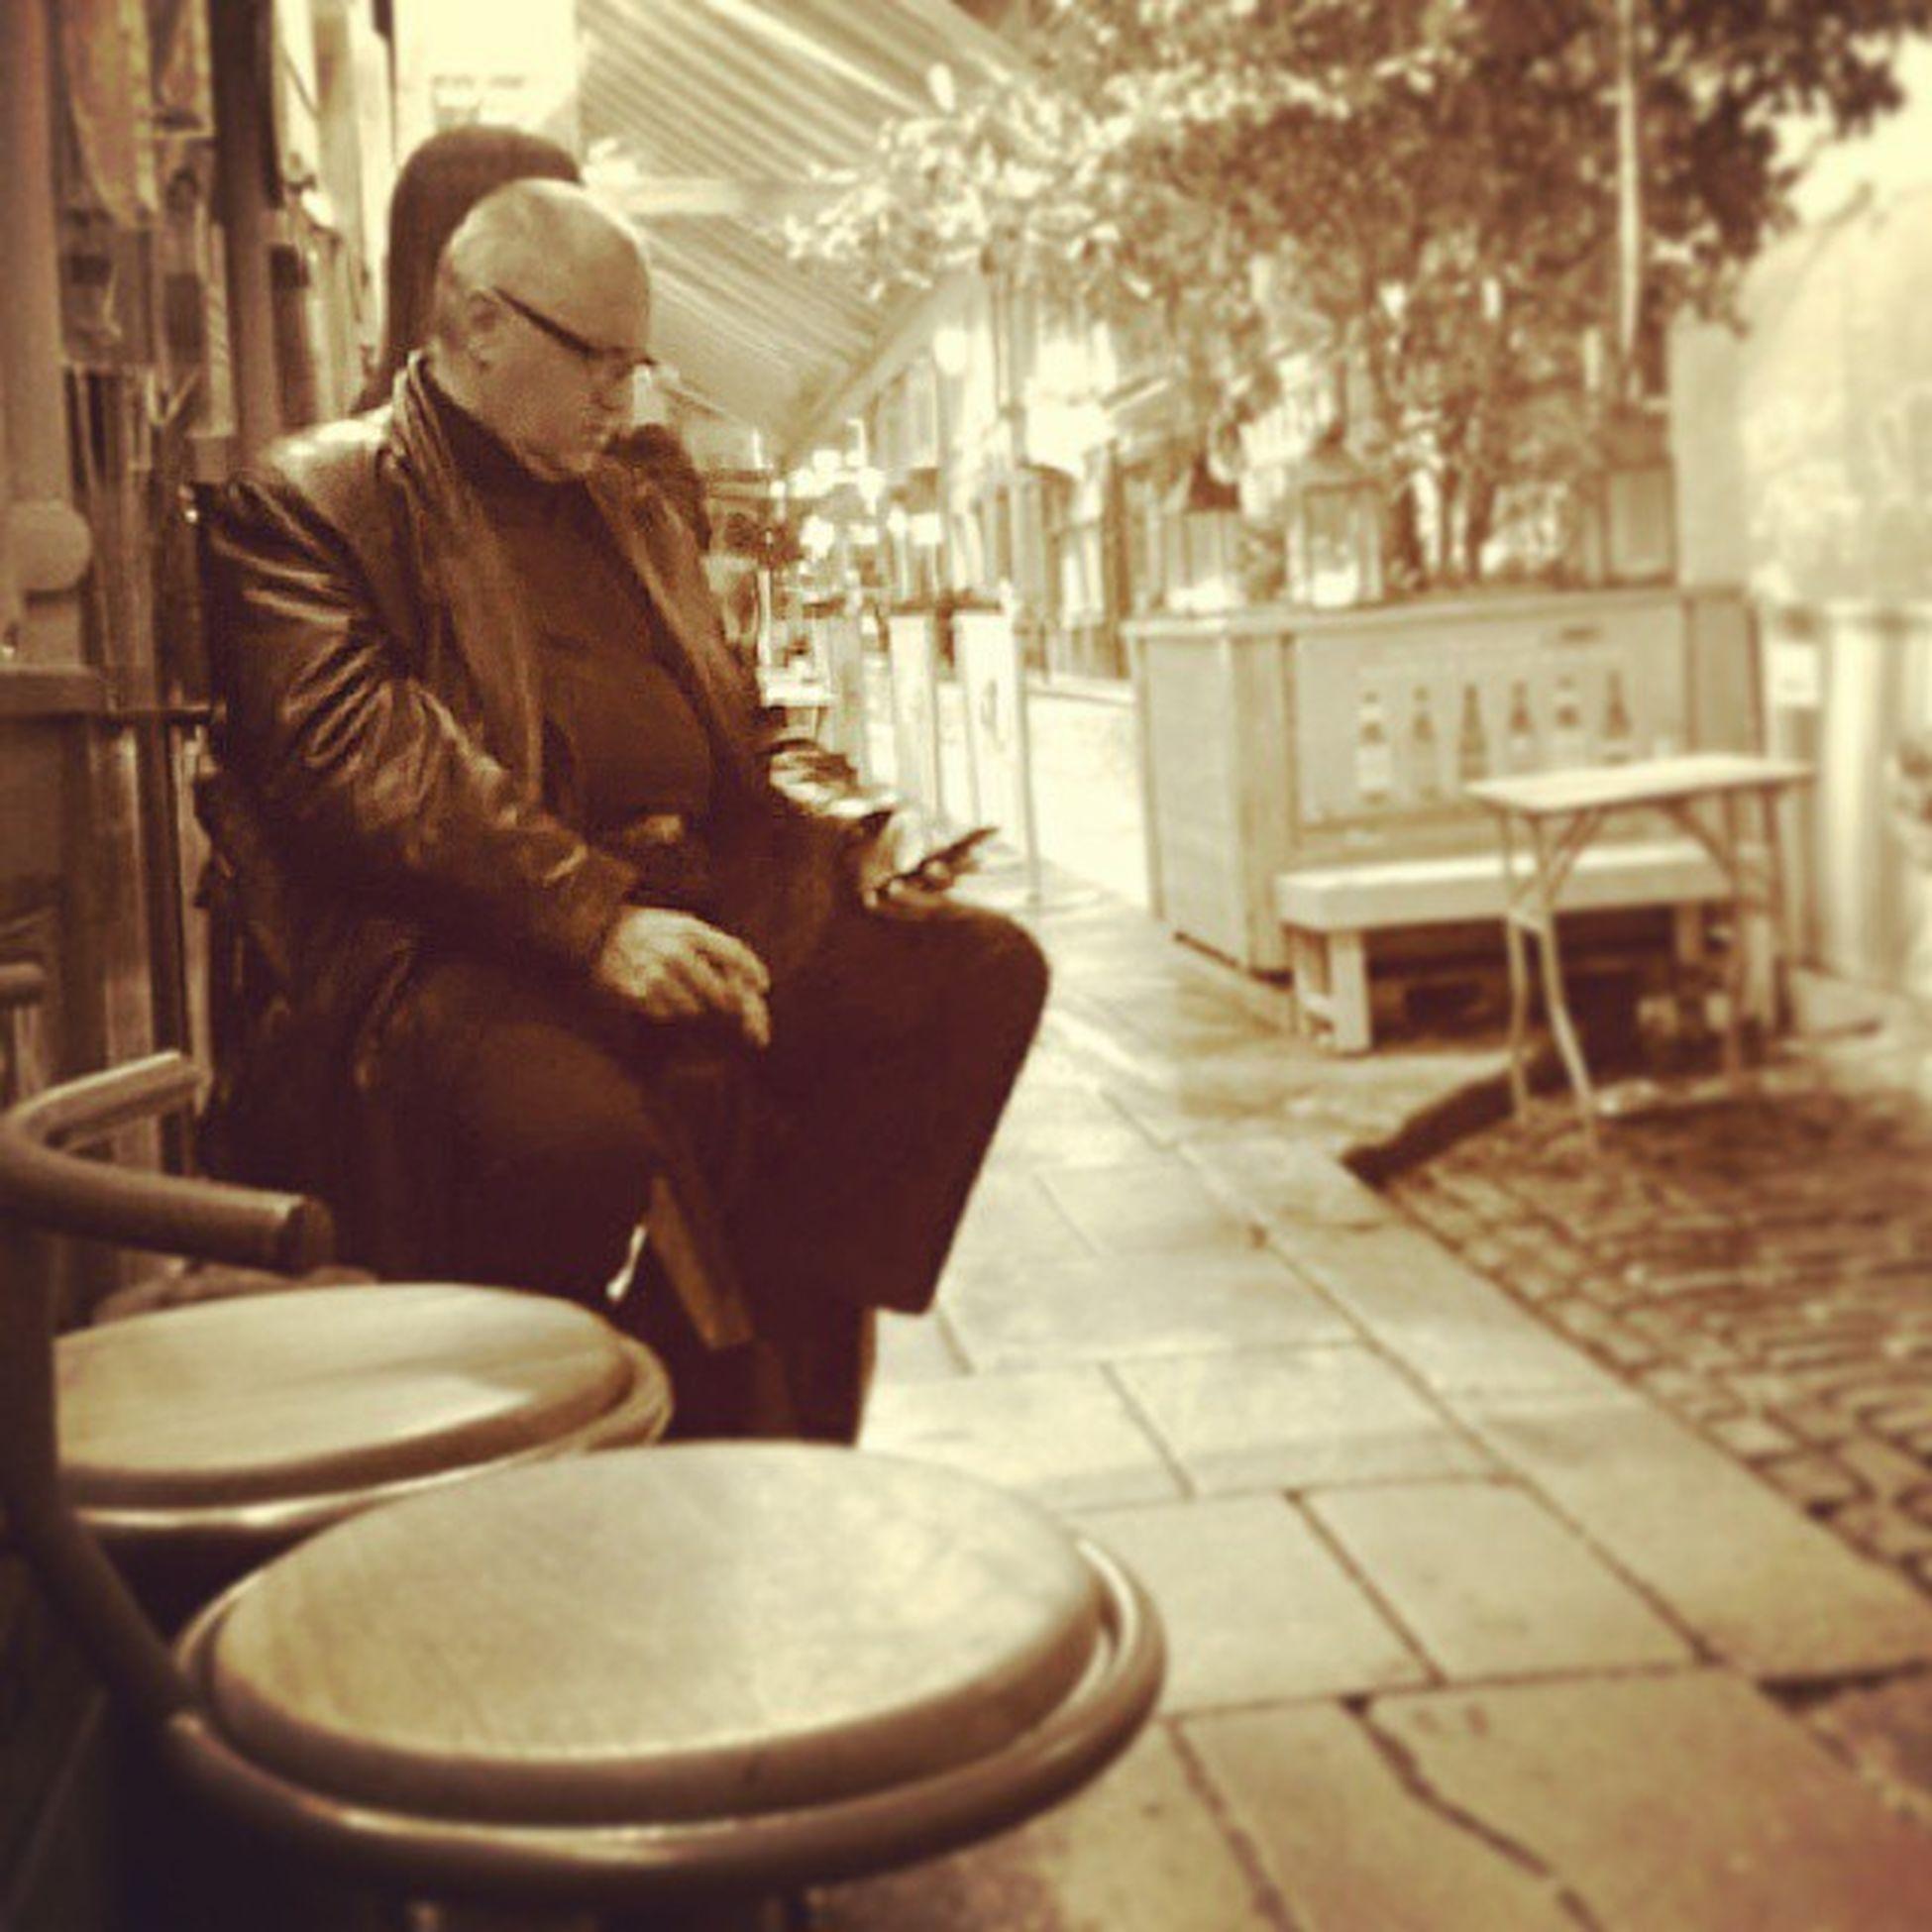 Mai solo. Dublinbynight Streetphotography